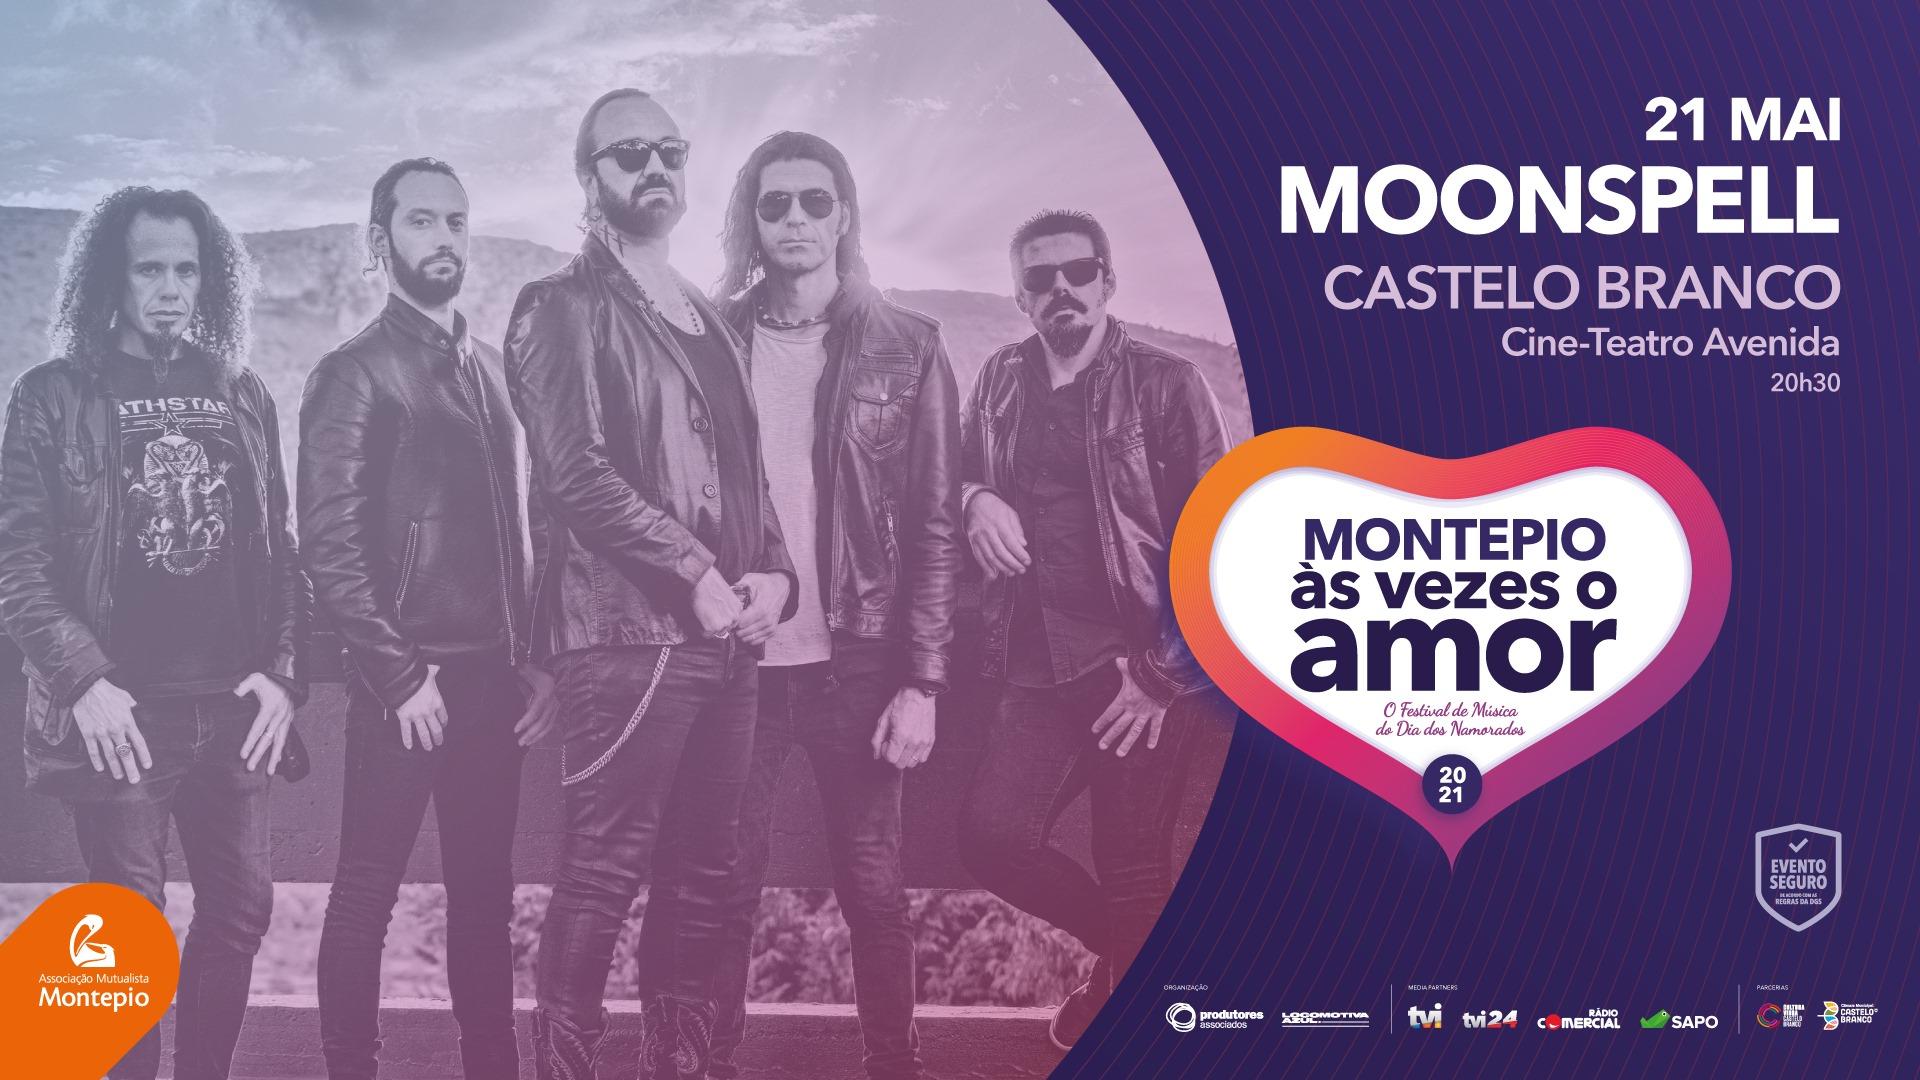 MOONSPELL - Montepio Às Vezes o Amor - CASTELO BRANCO